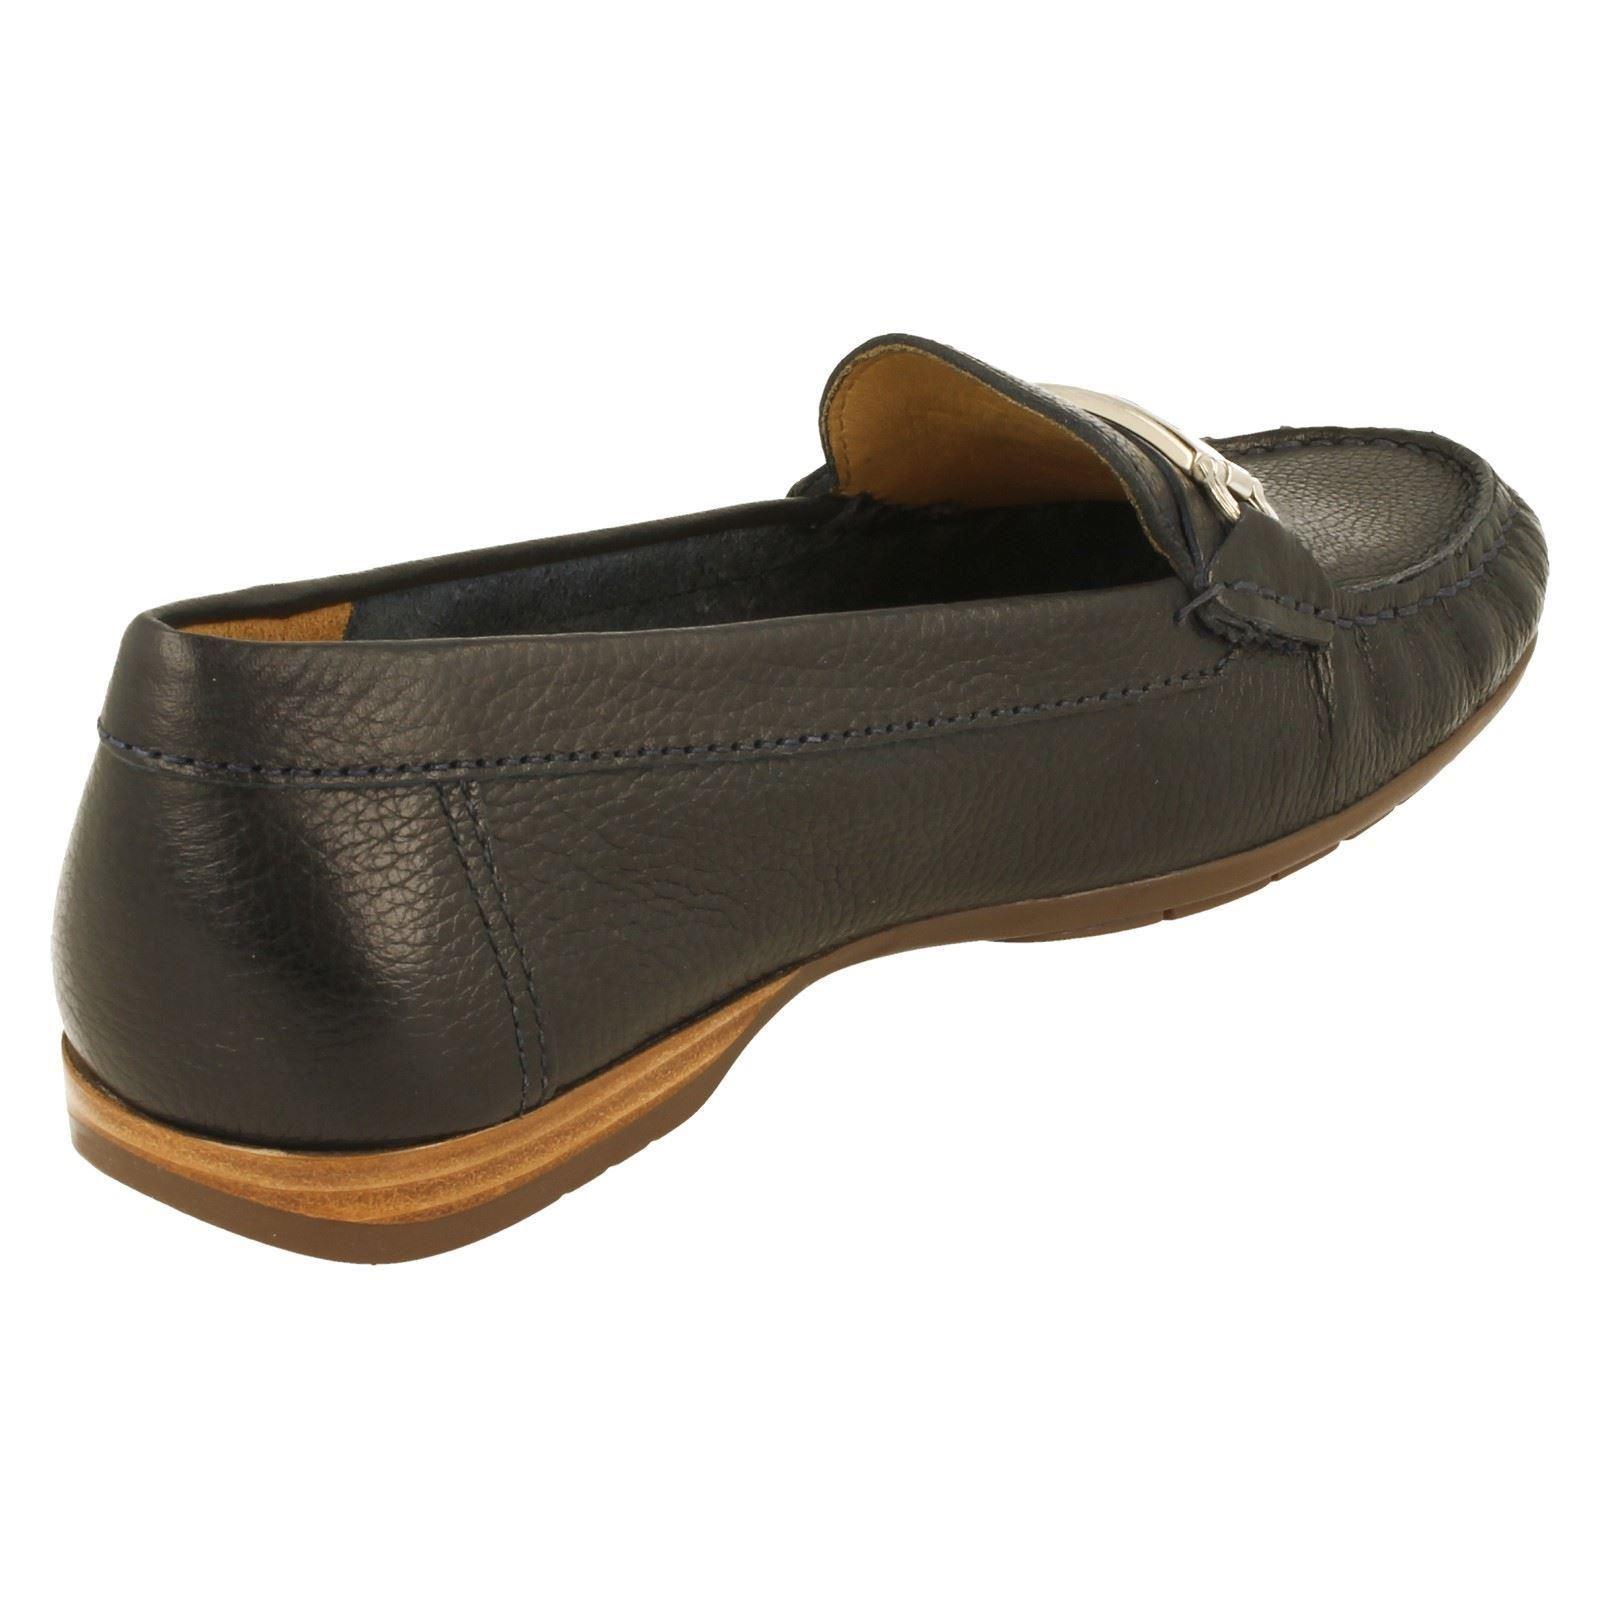 Ladie Globo Globo Globo Loafers Style Eldon-W 09ad78